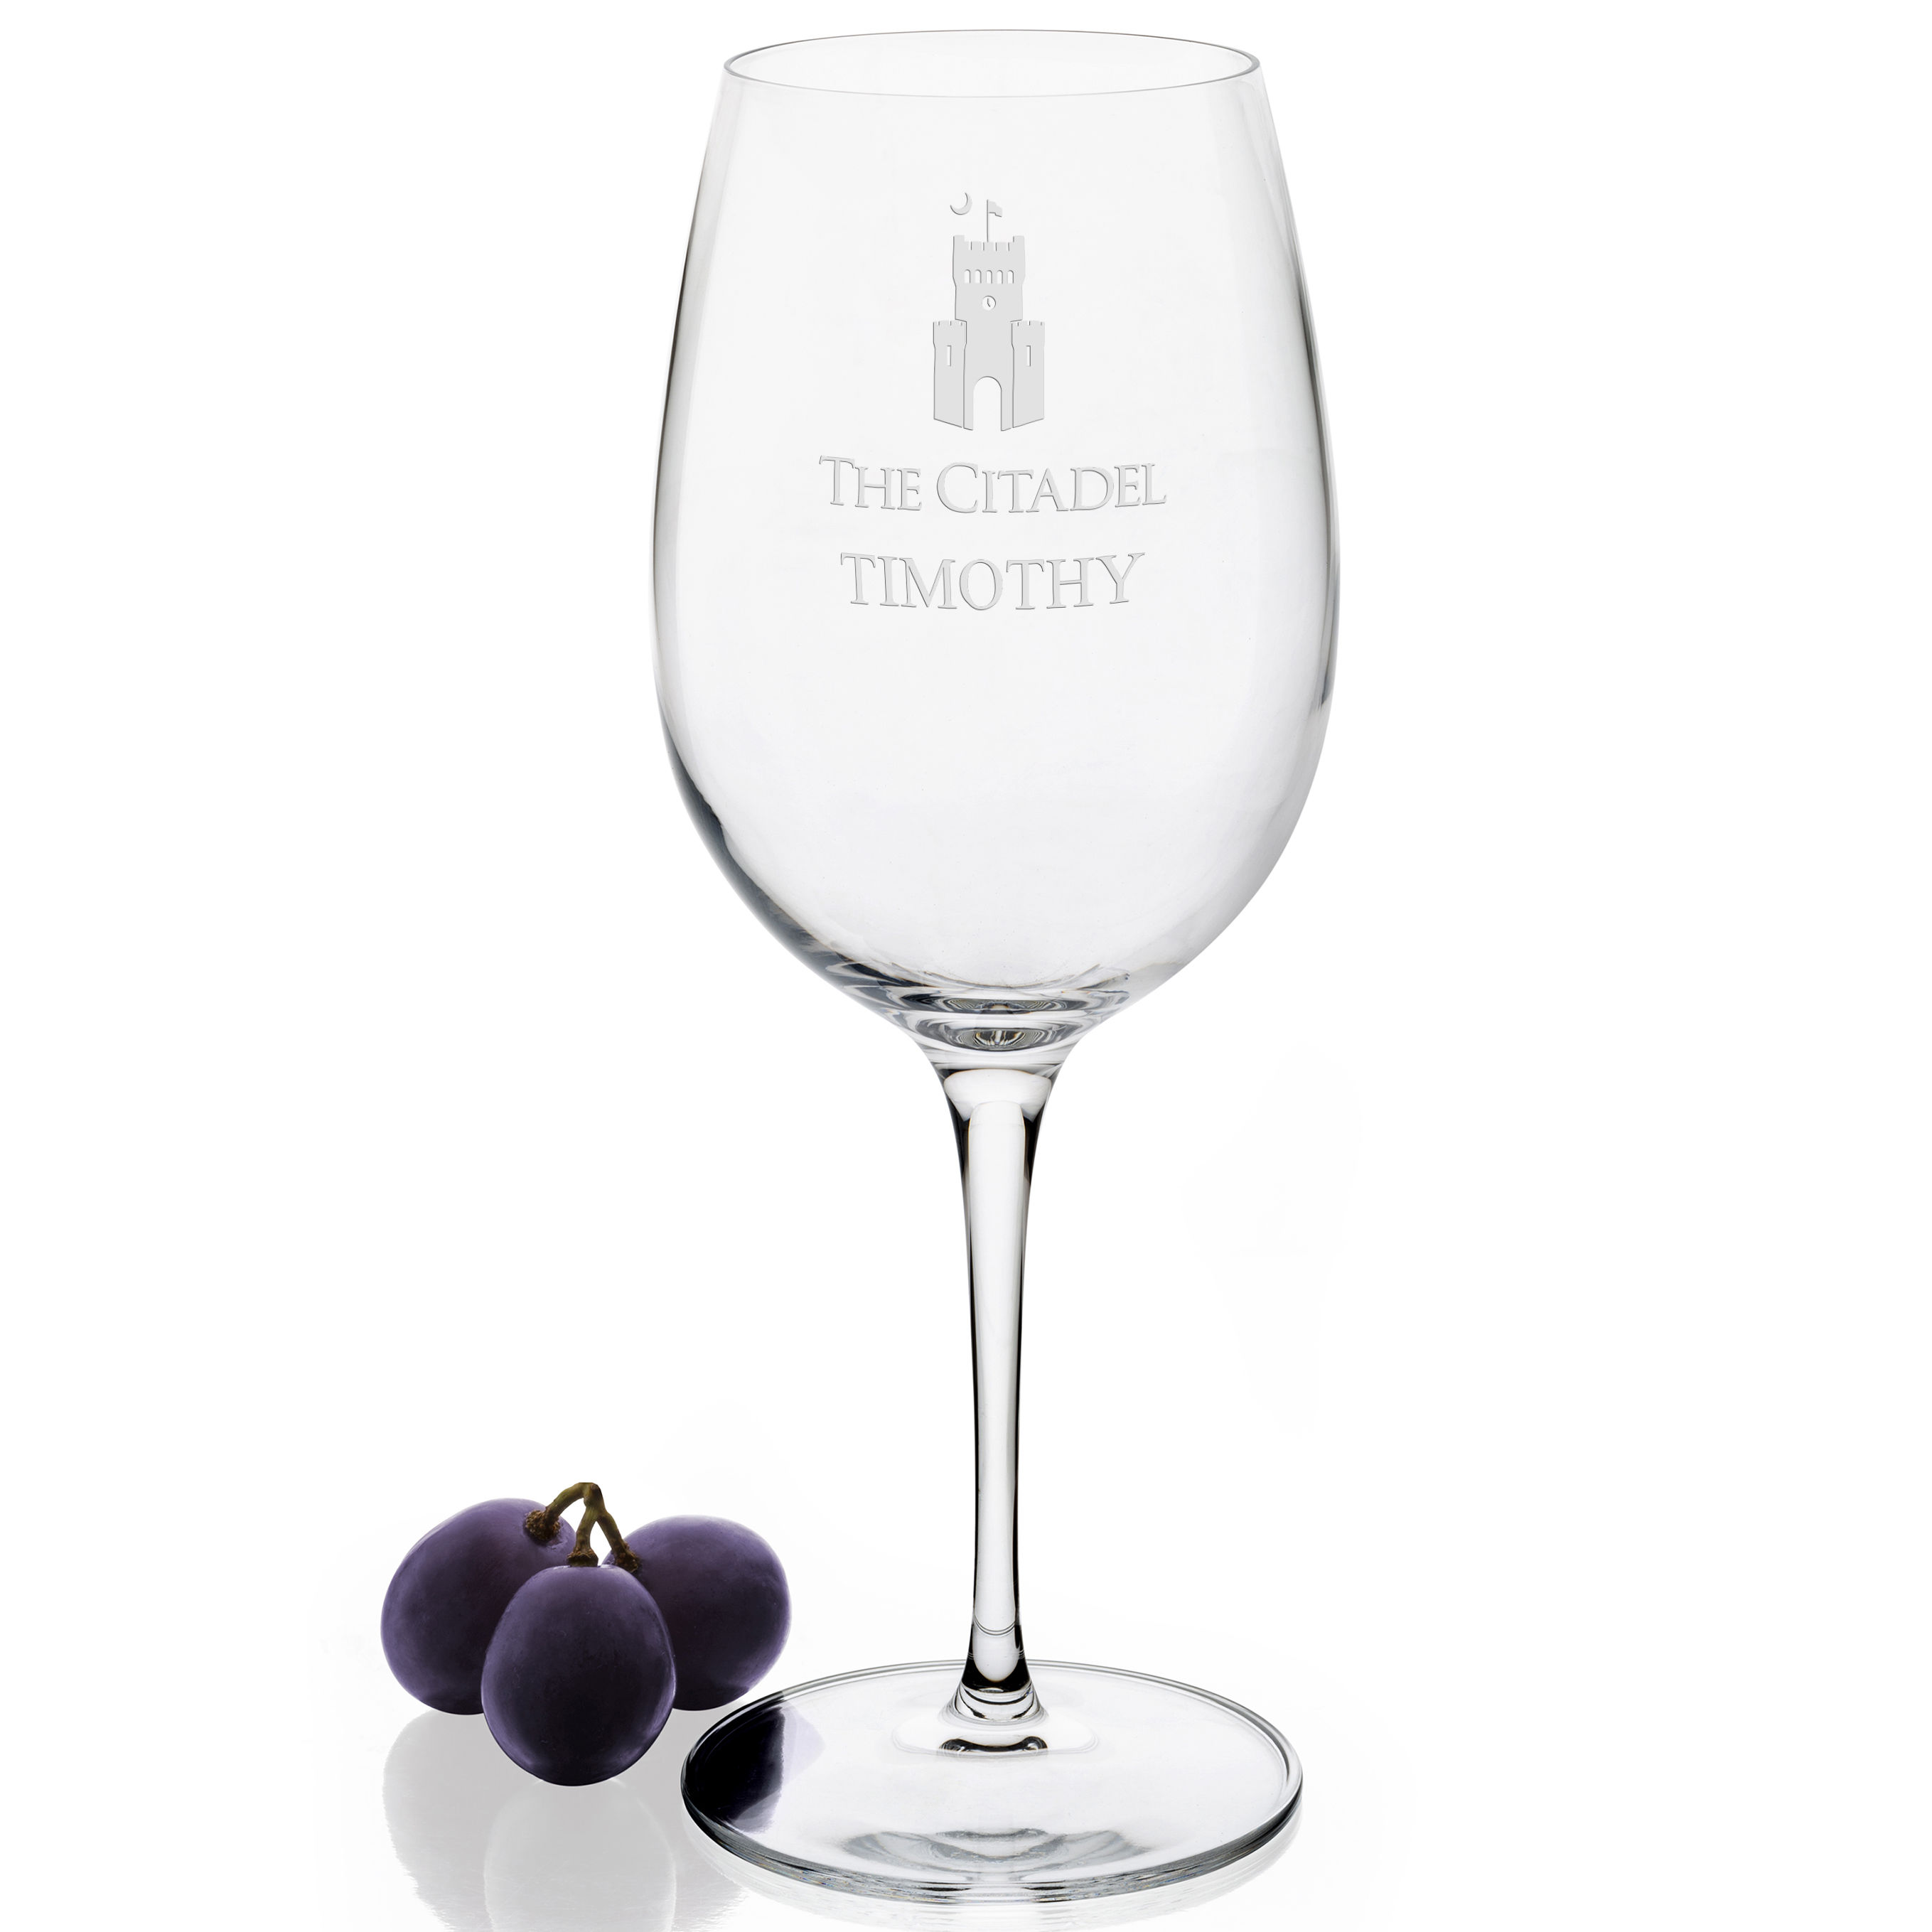 Citadel Red Wine Glasses - Set of 4 - Image 2